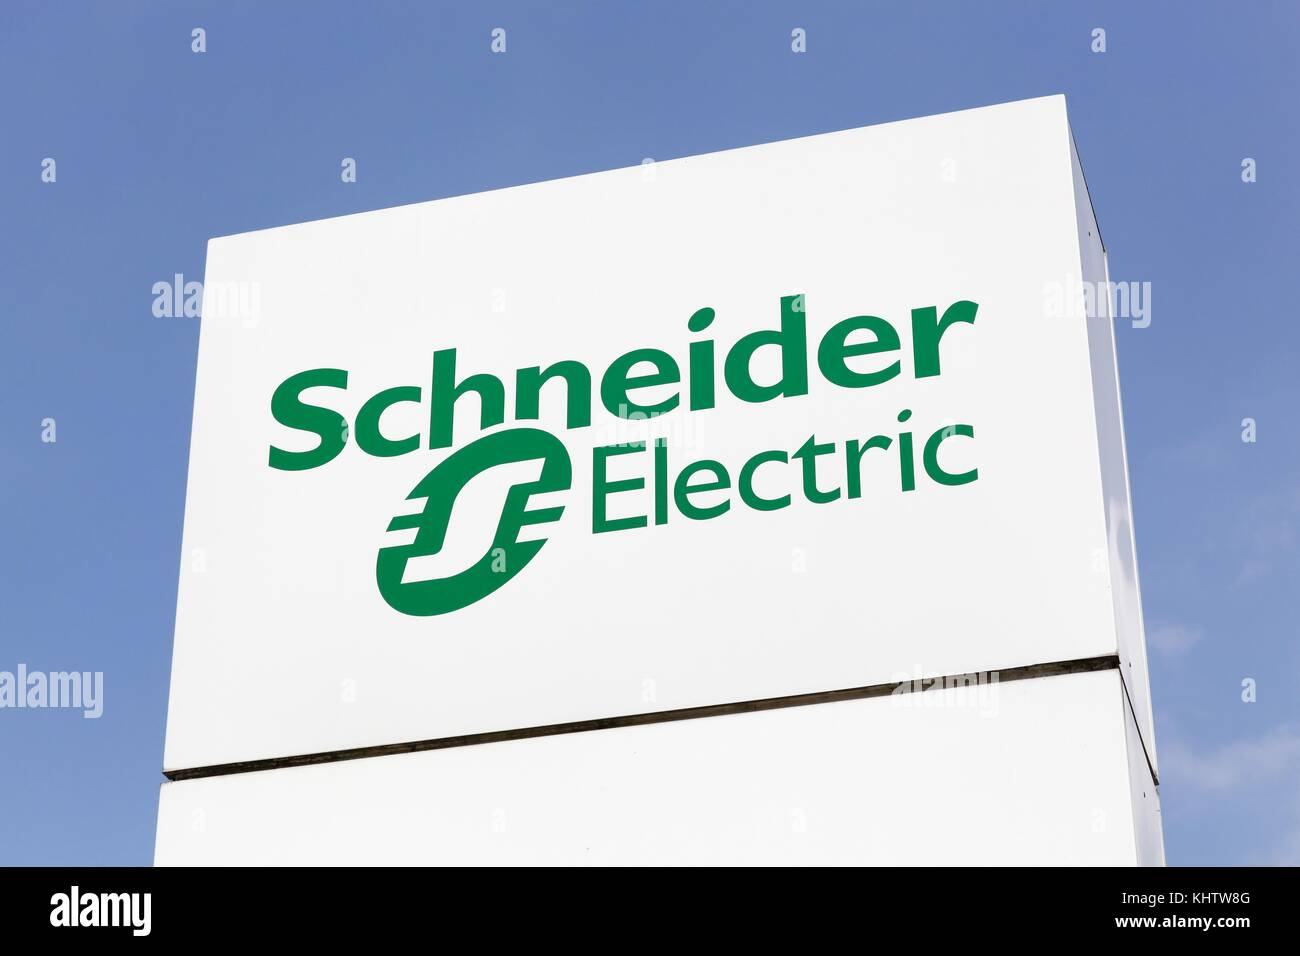 Schneider Electric Stock Photos Amp Schneider Electric Stock